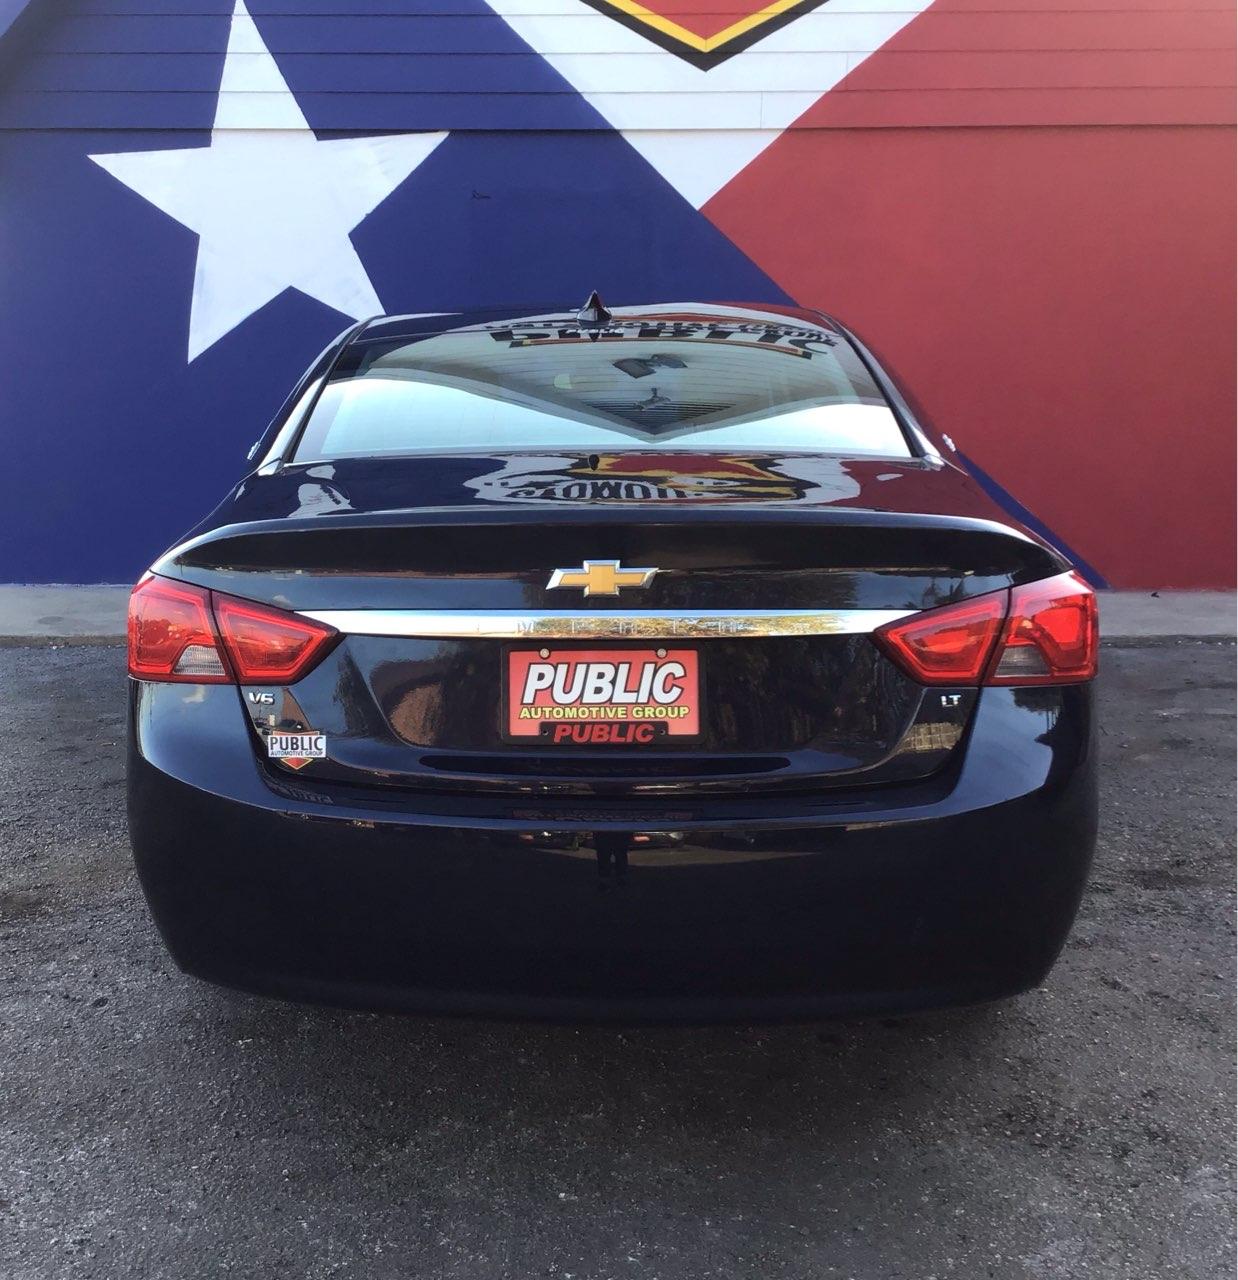 used vehicle - Sedan CHEVROLET IMPALA 2016